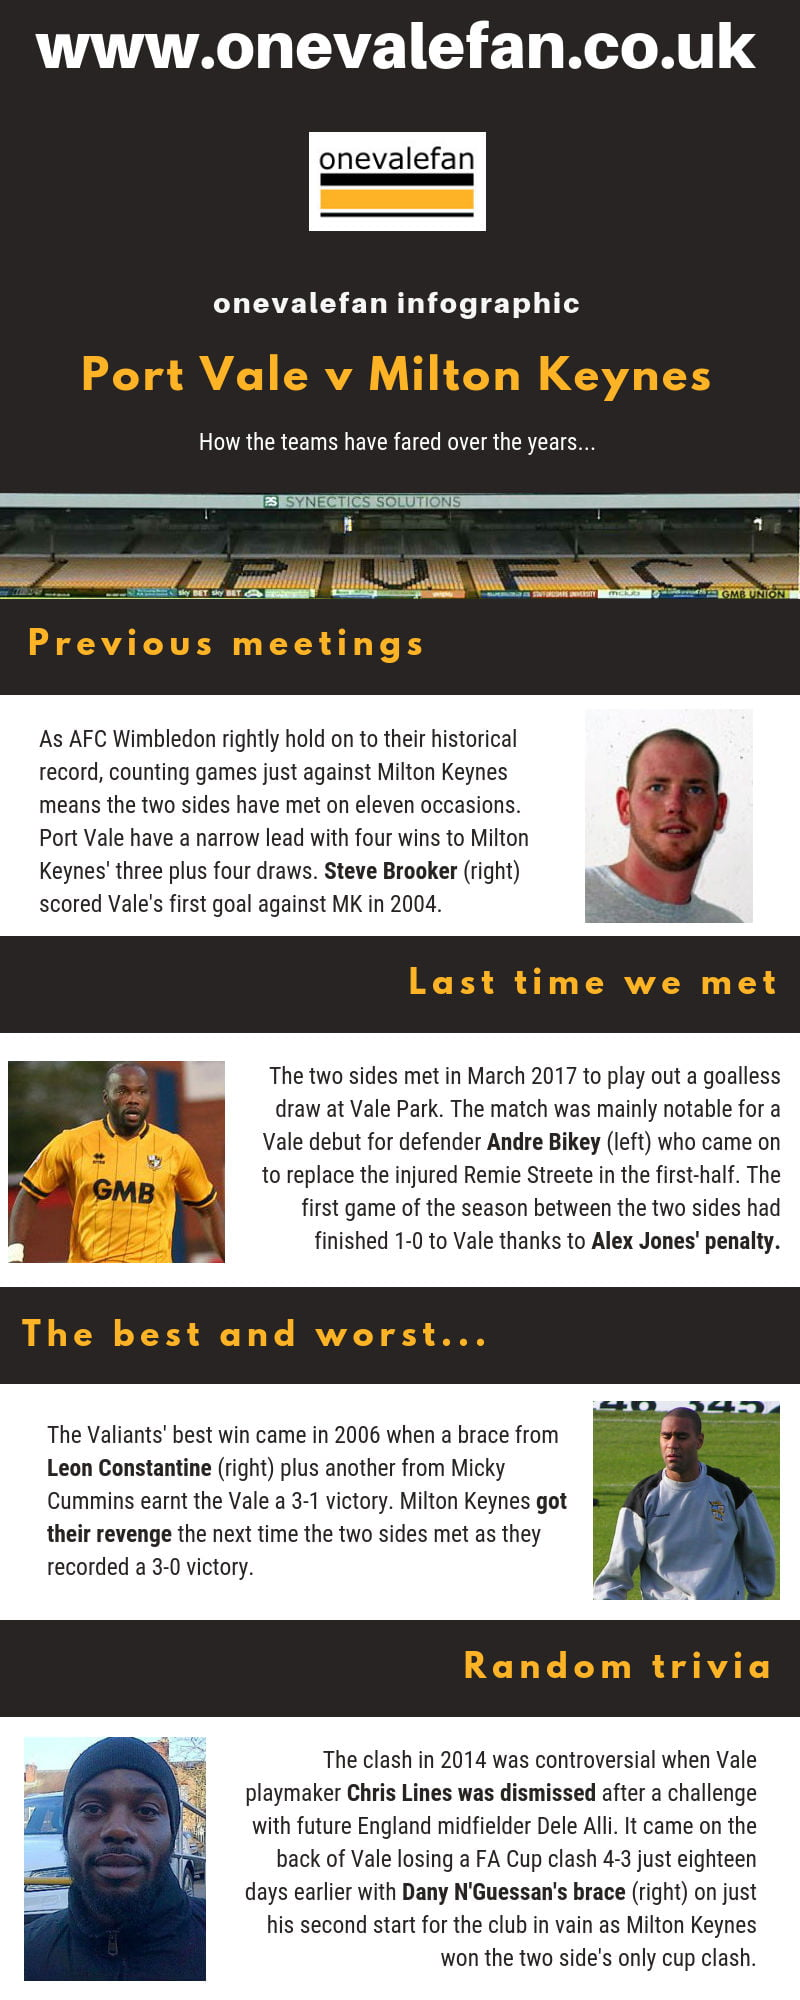 Port Vale vs Milton Keynes infographic